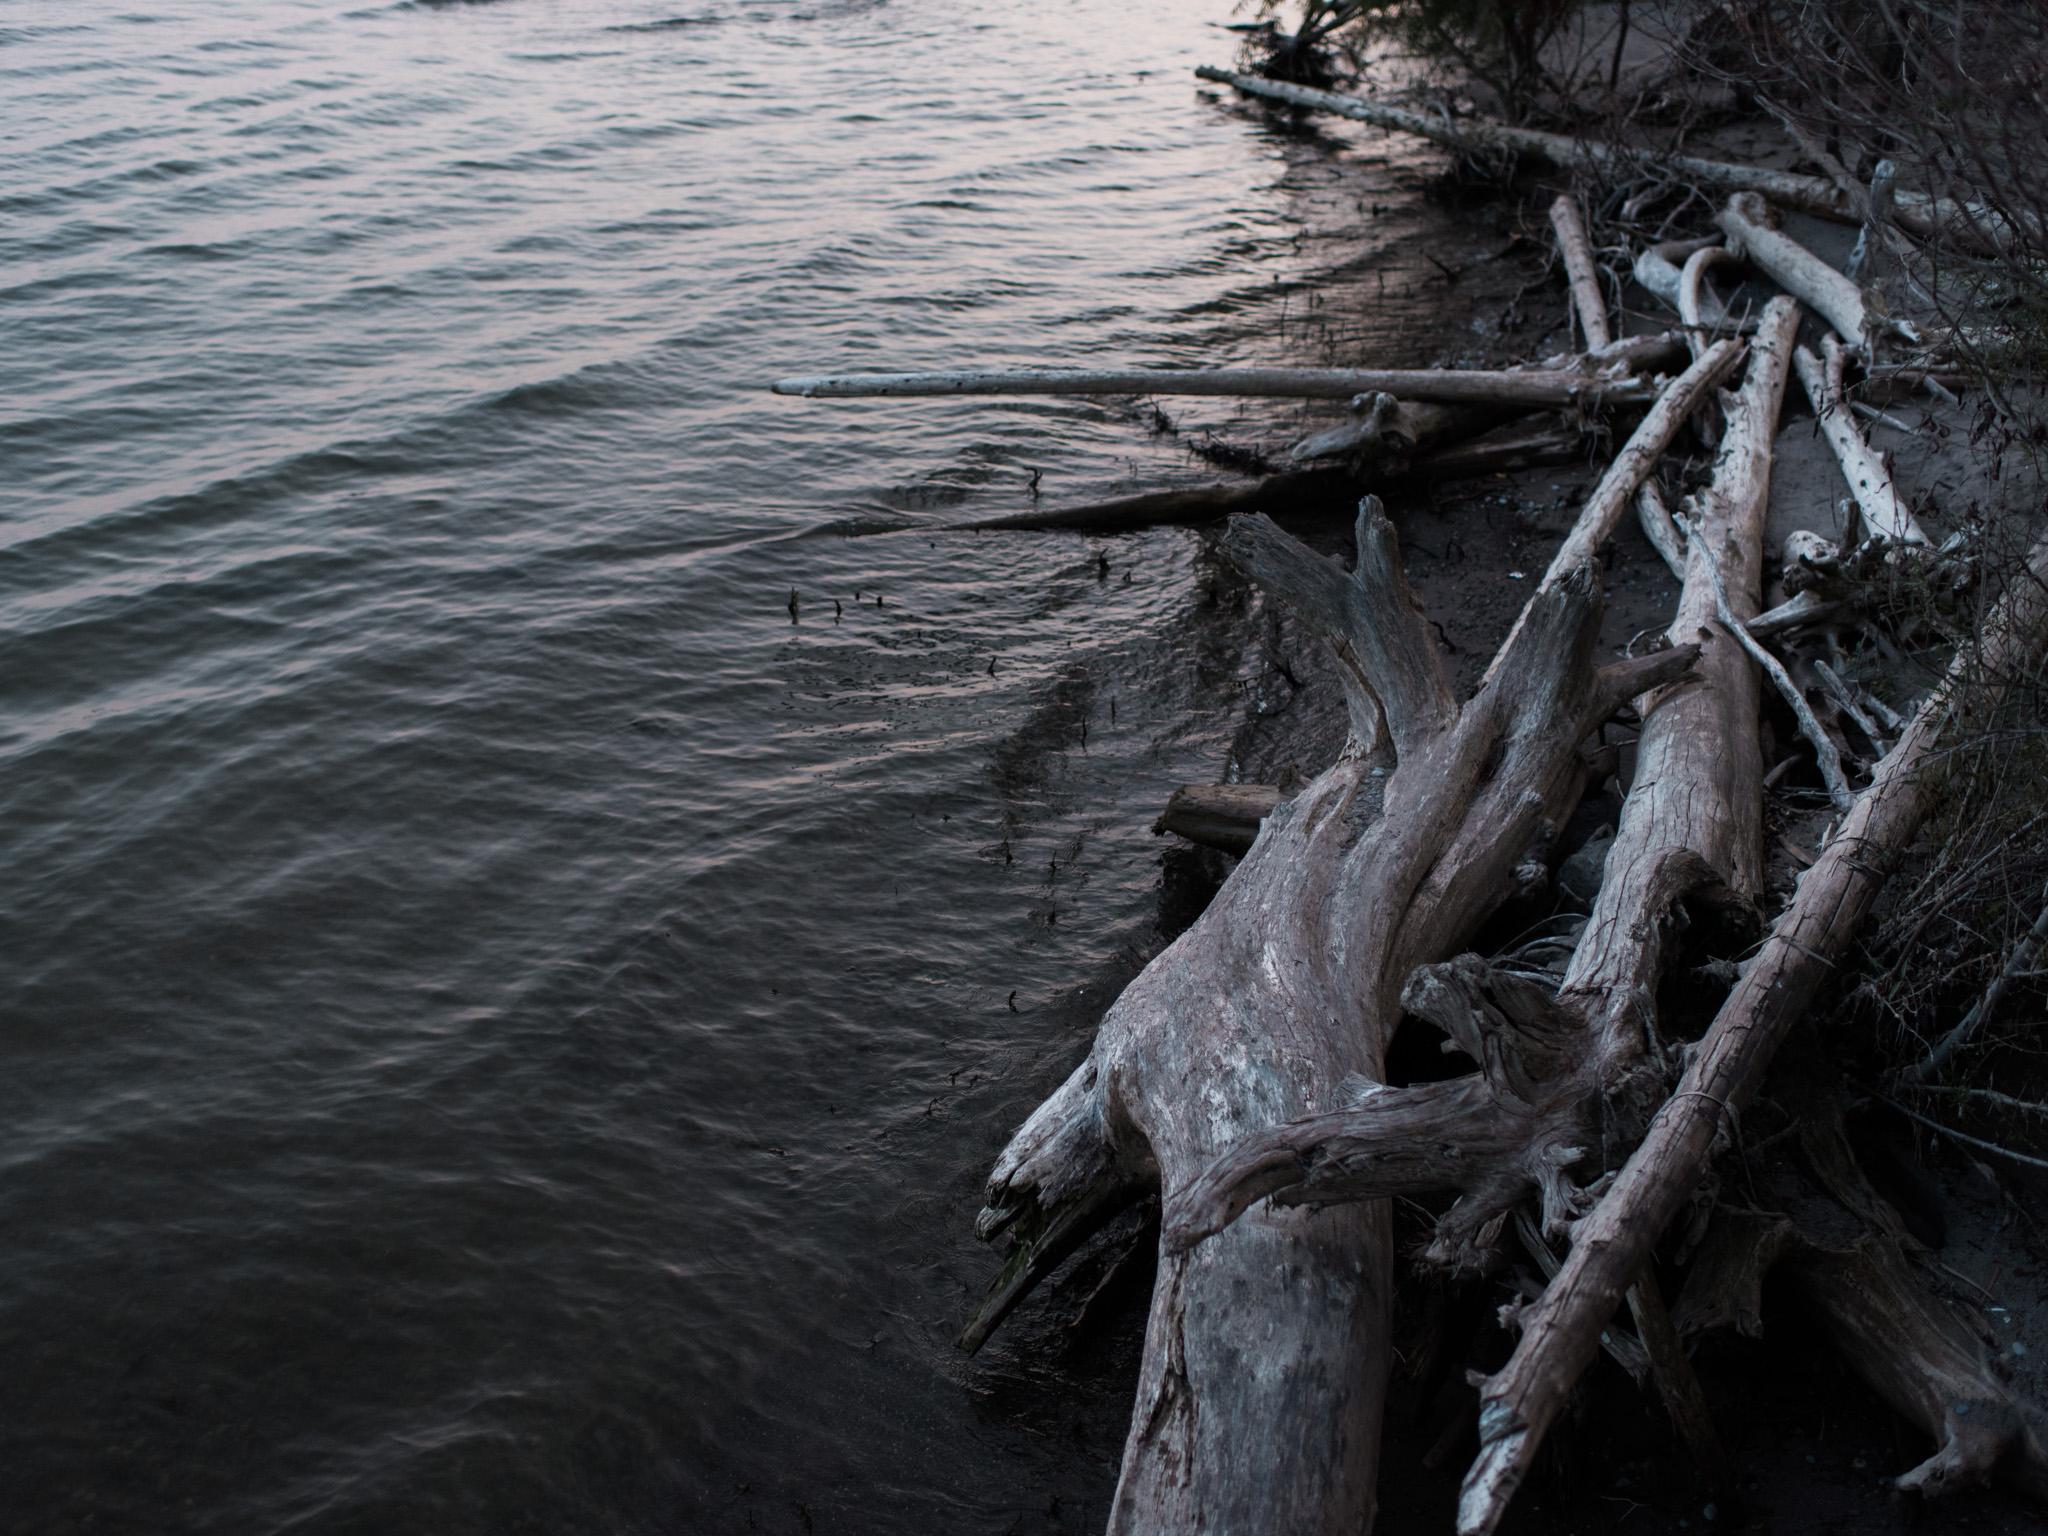 sunsetbeachengagement-torontoweddingphotographer-5.jpg